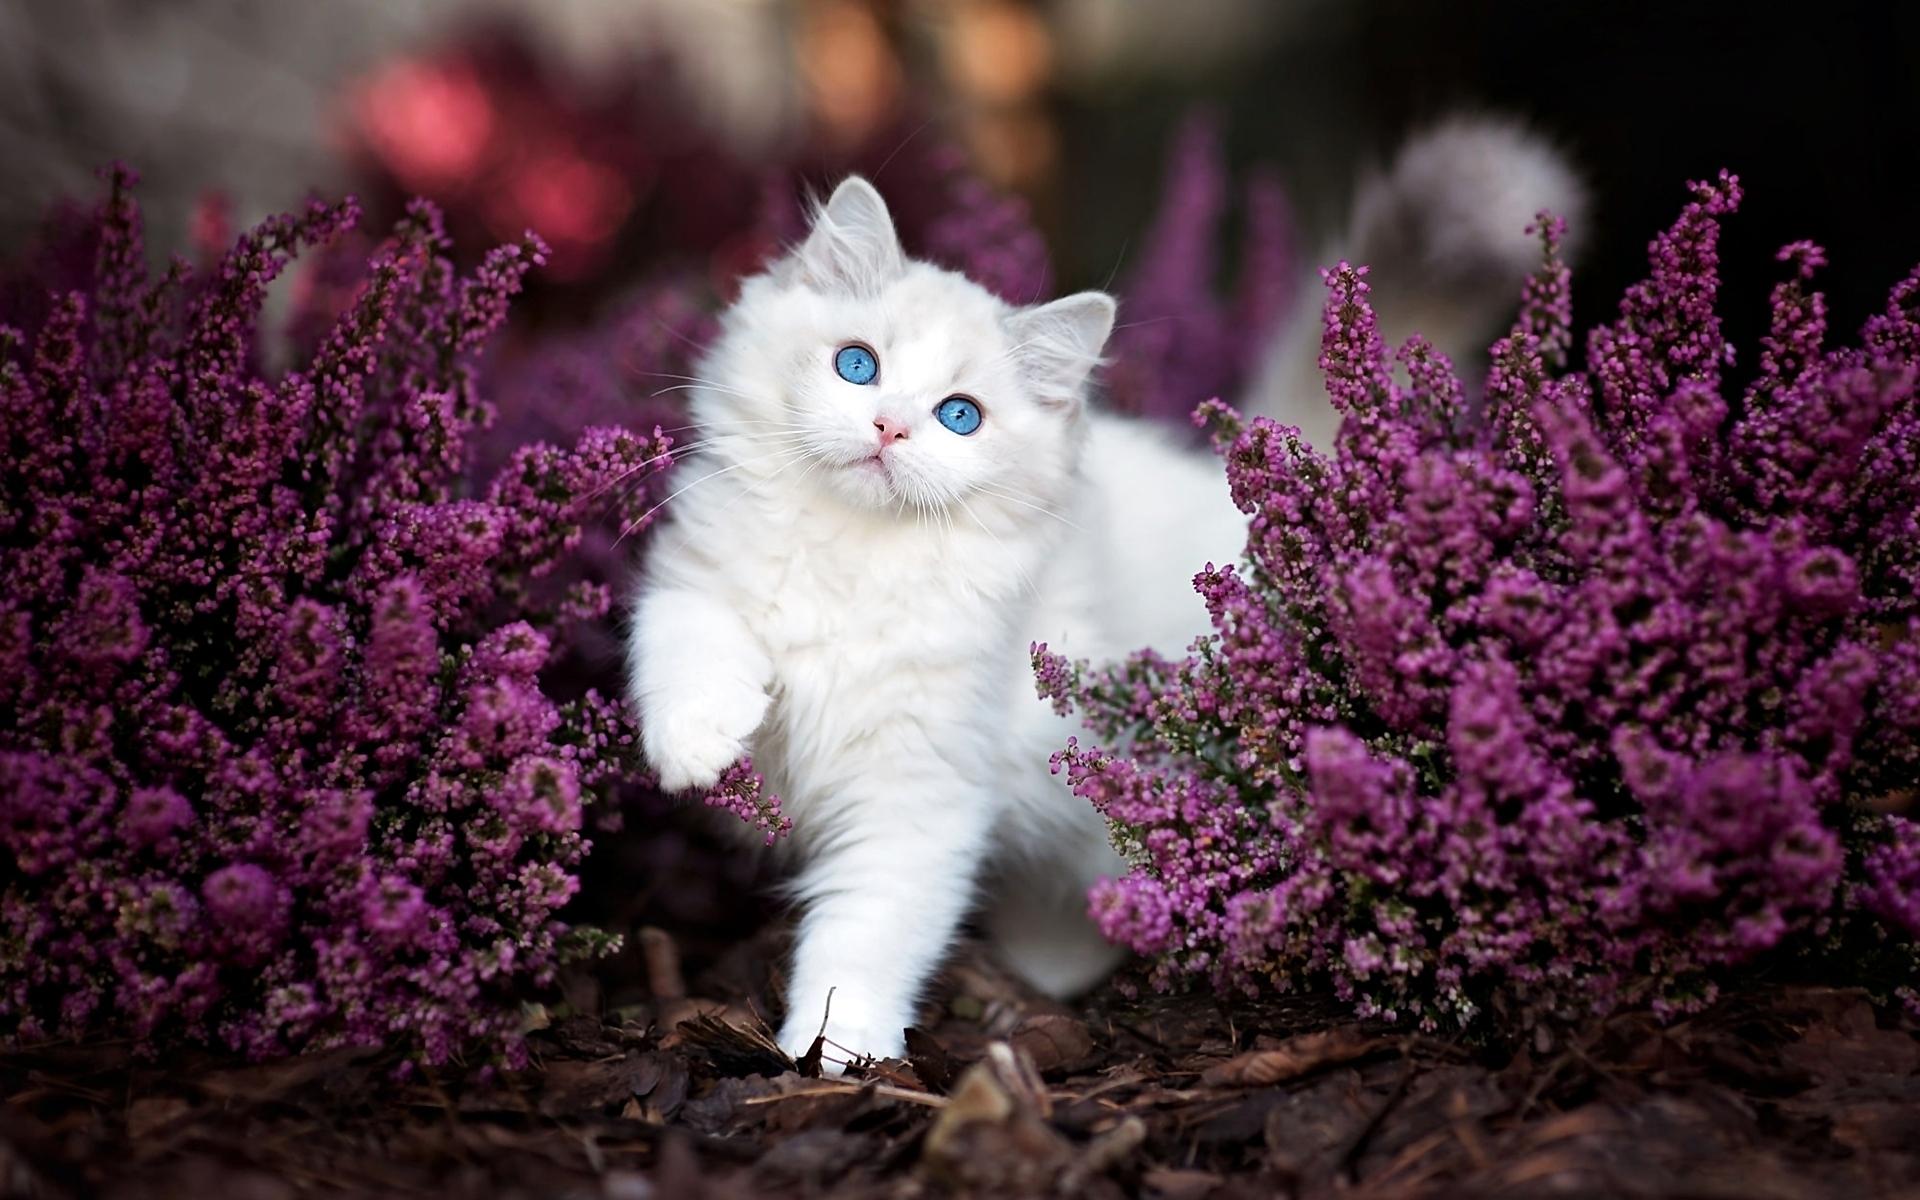 природа животные кот белый nature animals cat white  № 102716 бесплатно